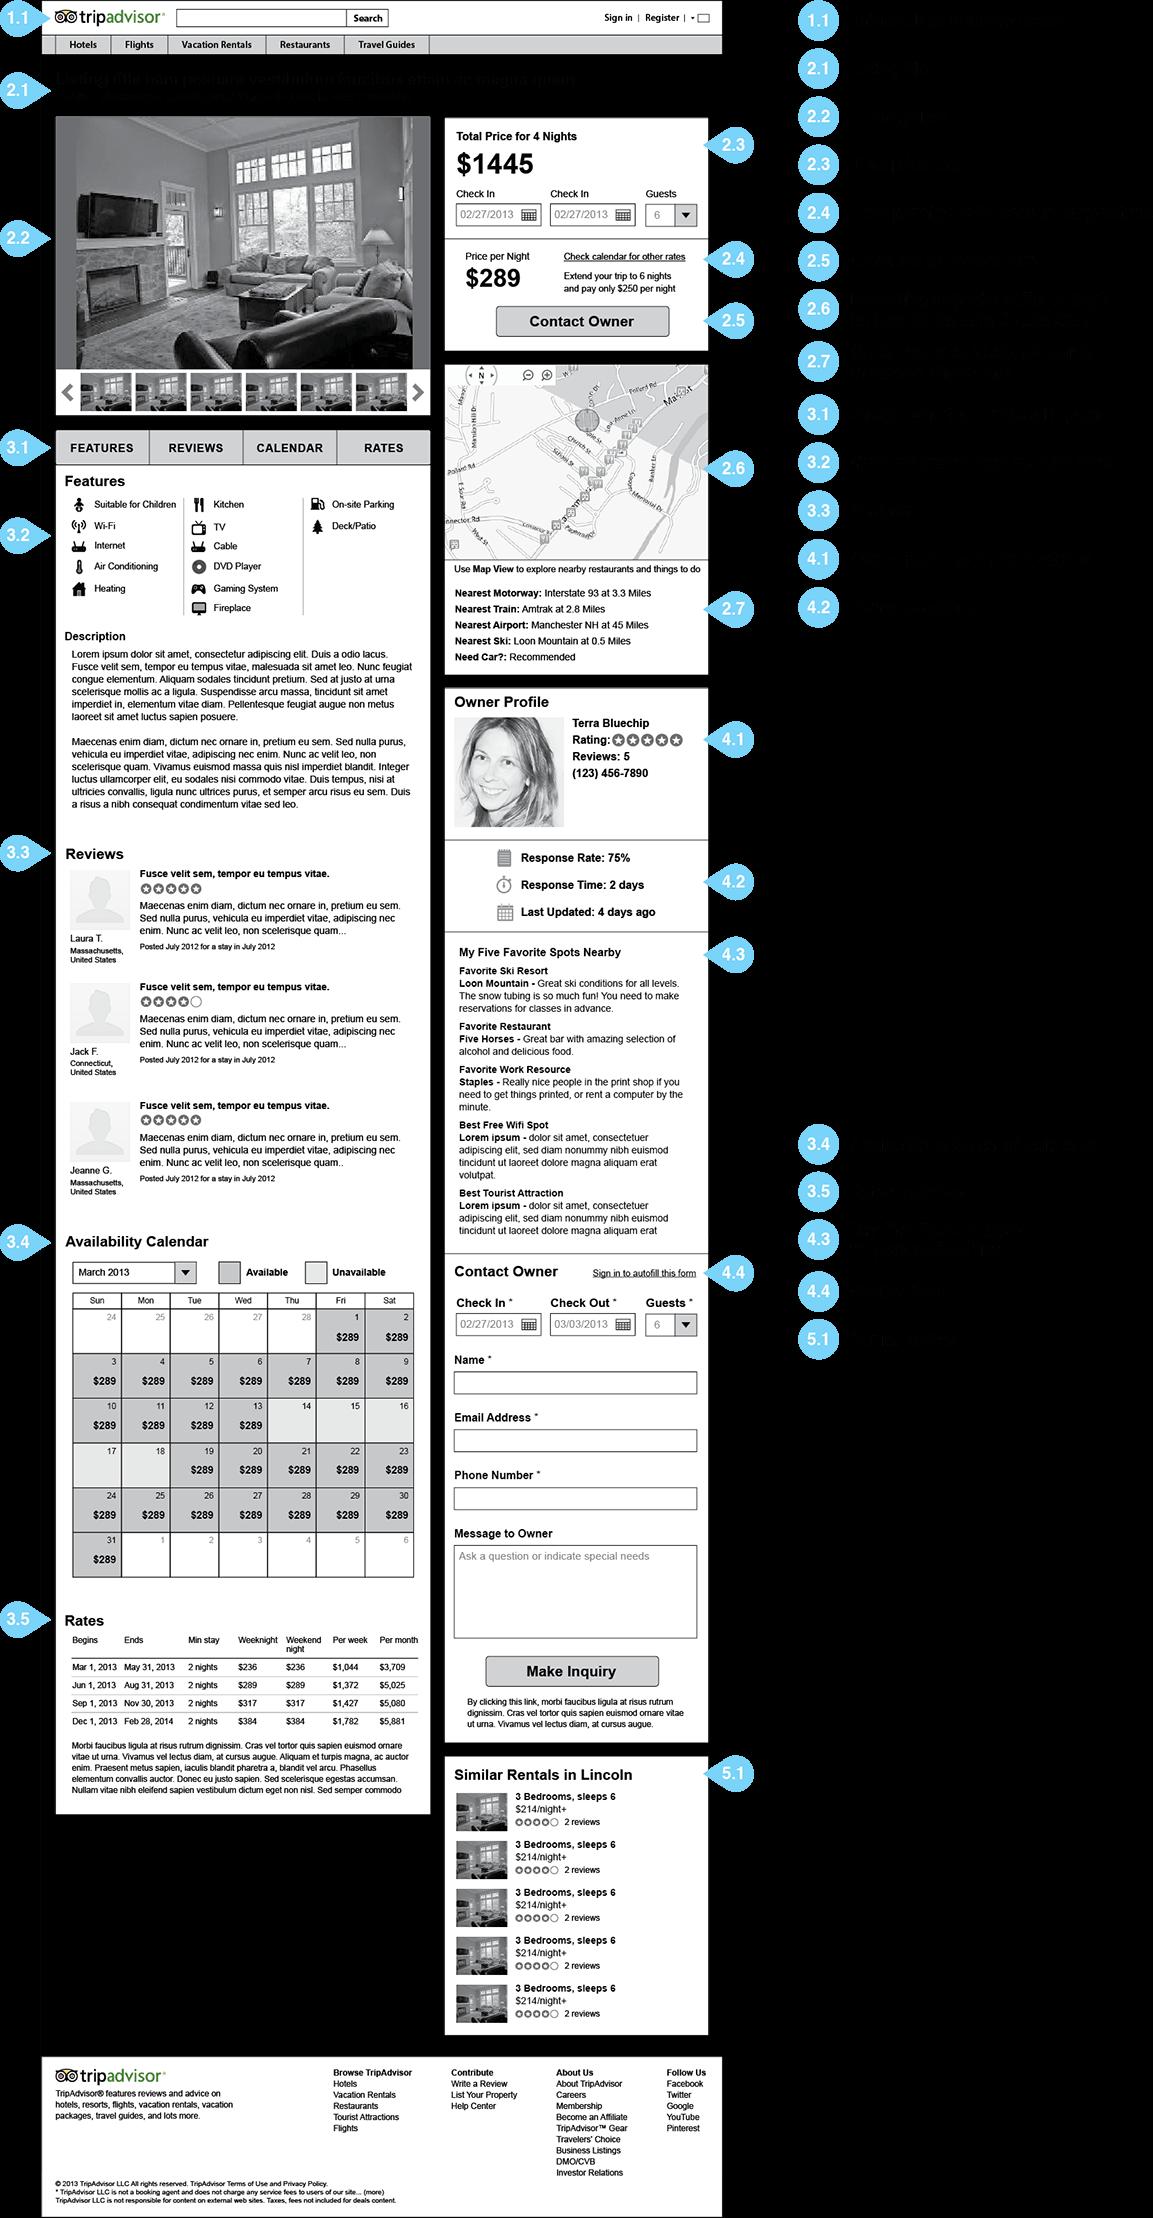 CY-Tripadvisor_listing.png